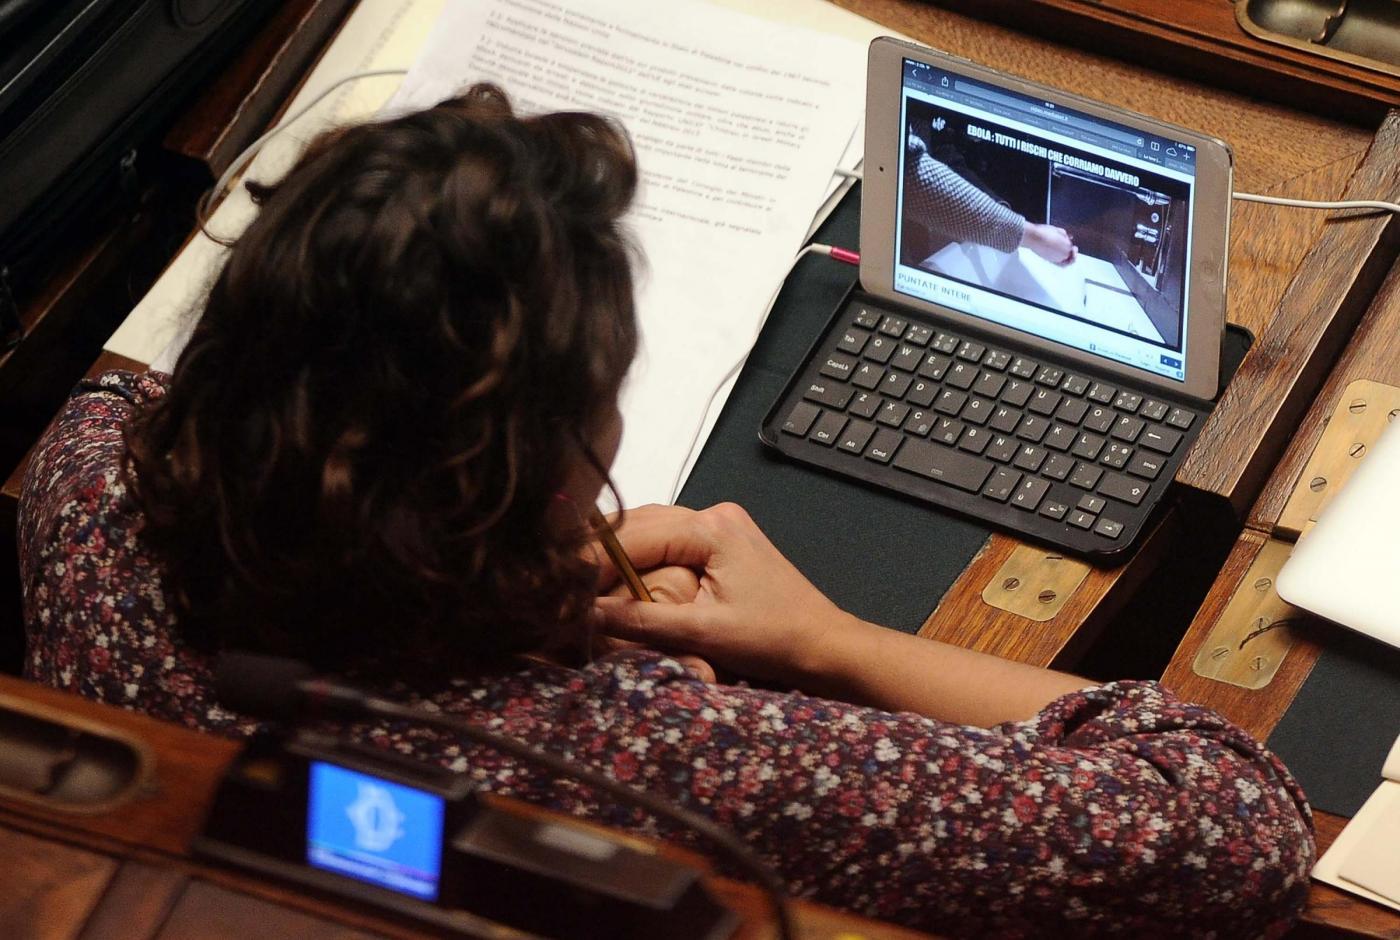 Camera Deputati, ridono i fannulloni: stop ai giornalisti in aula